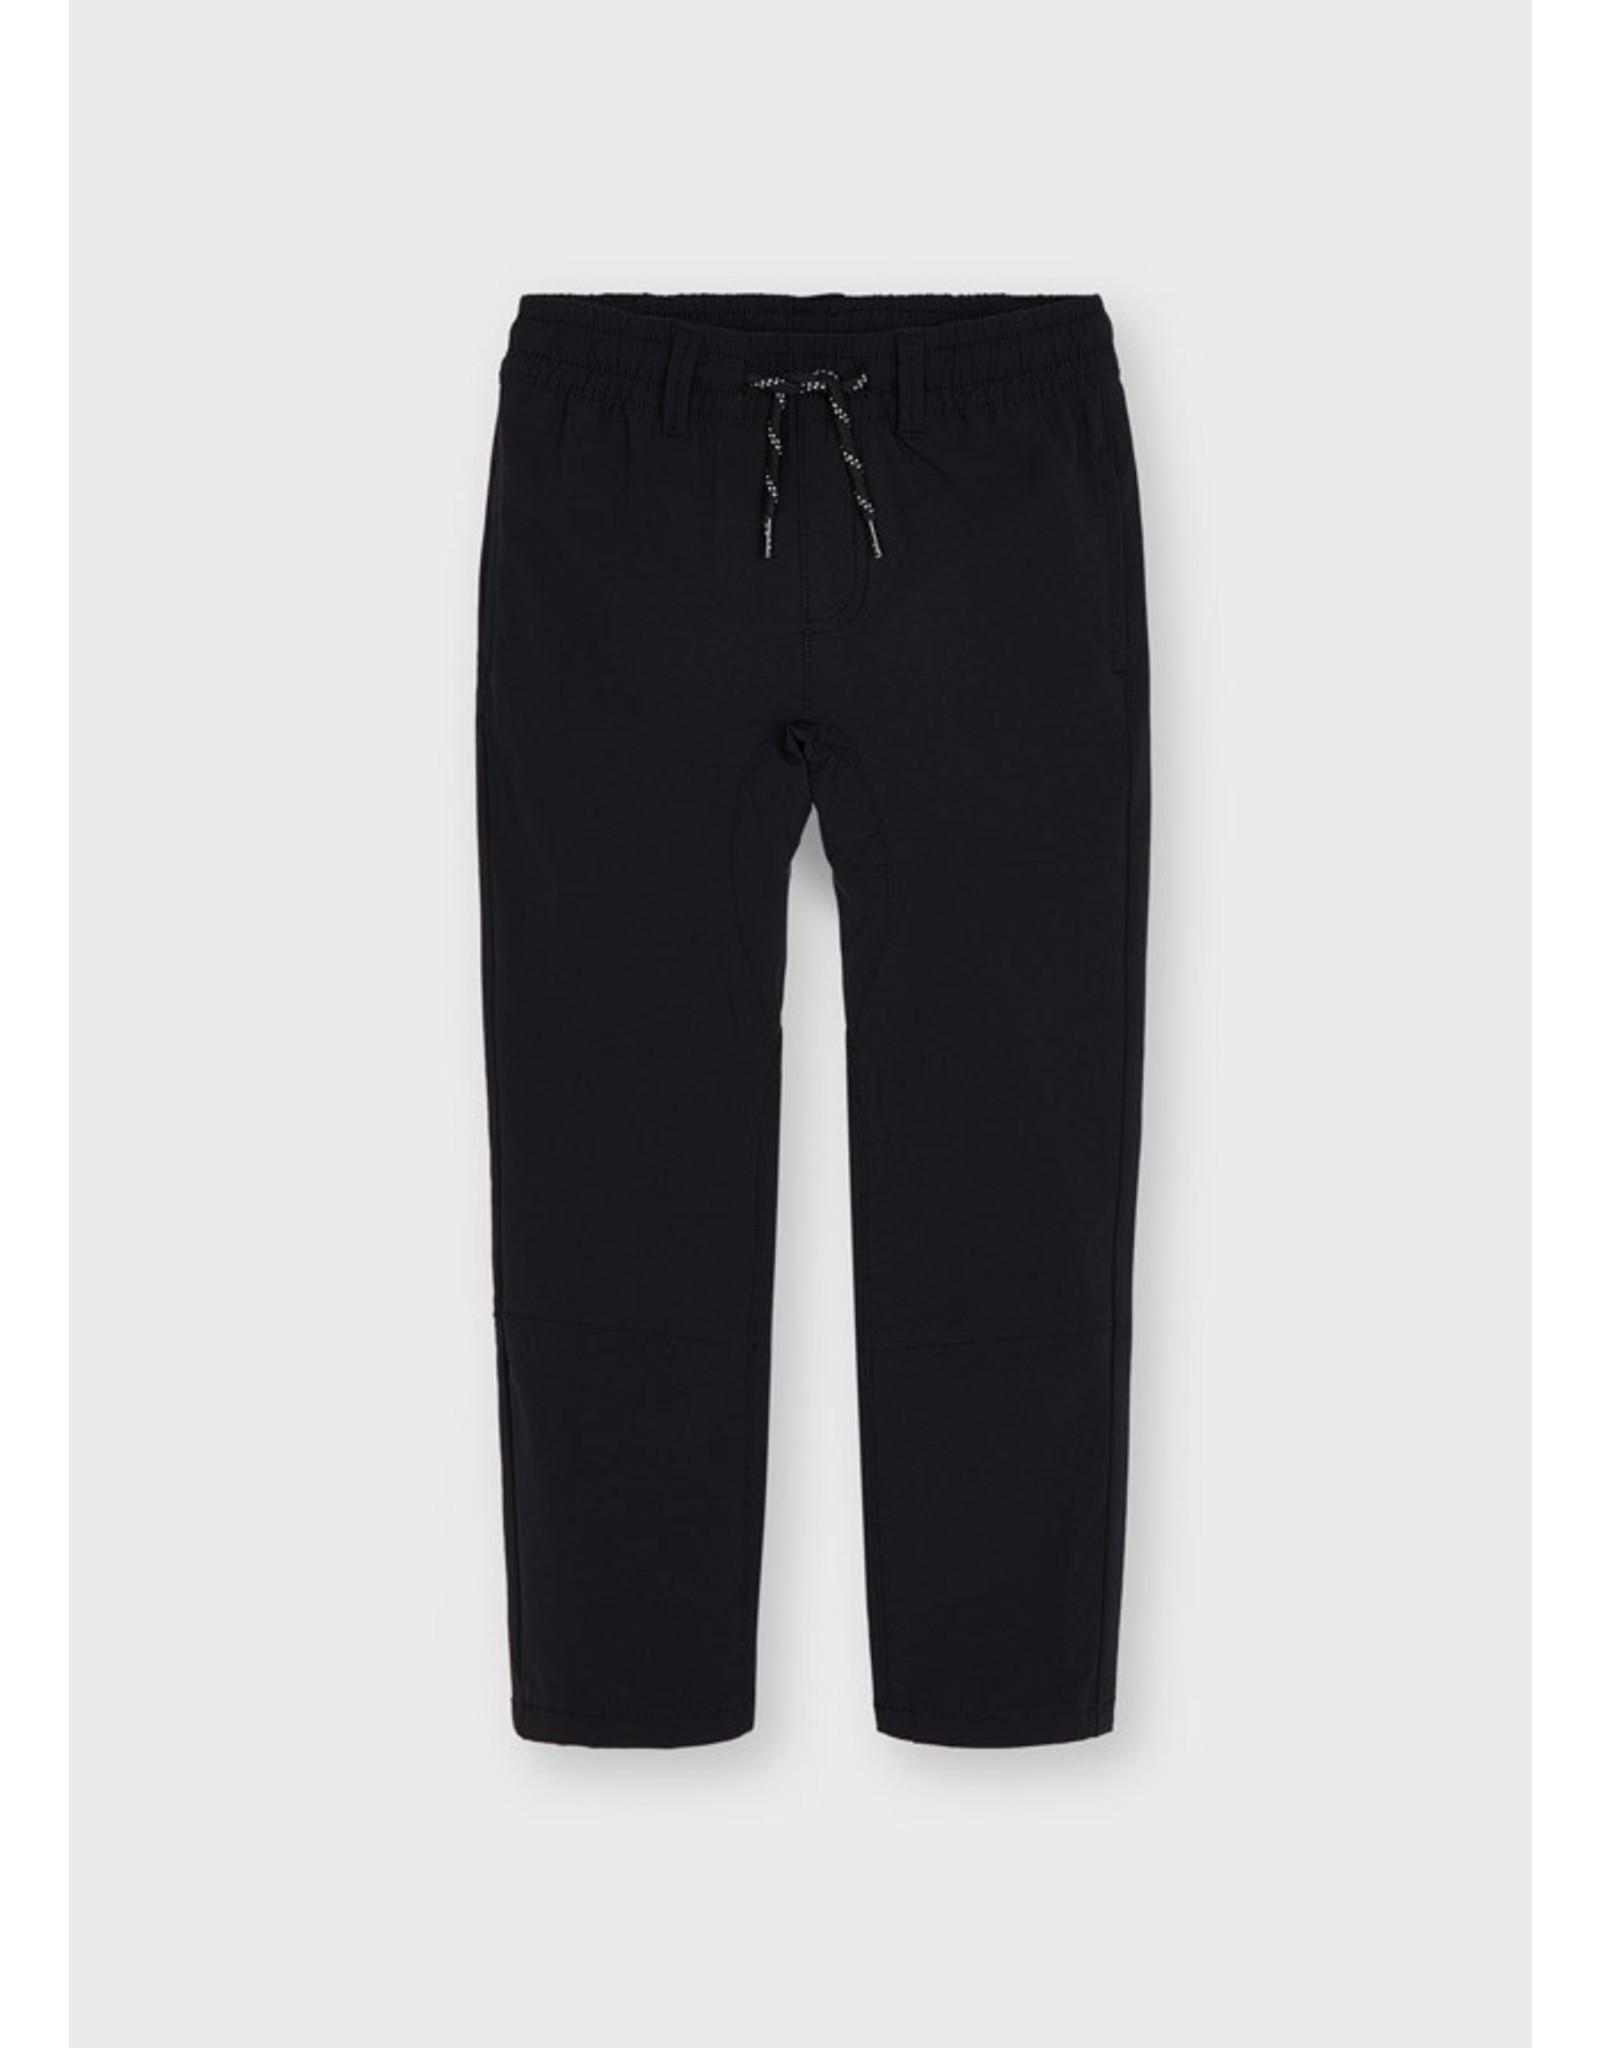 Mayoral Black Elastic Trousers